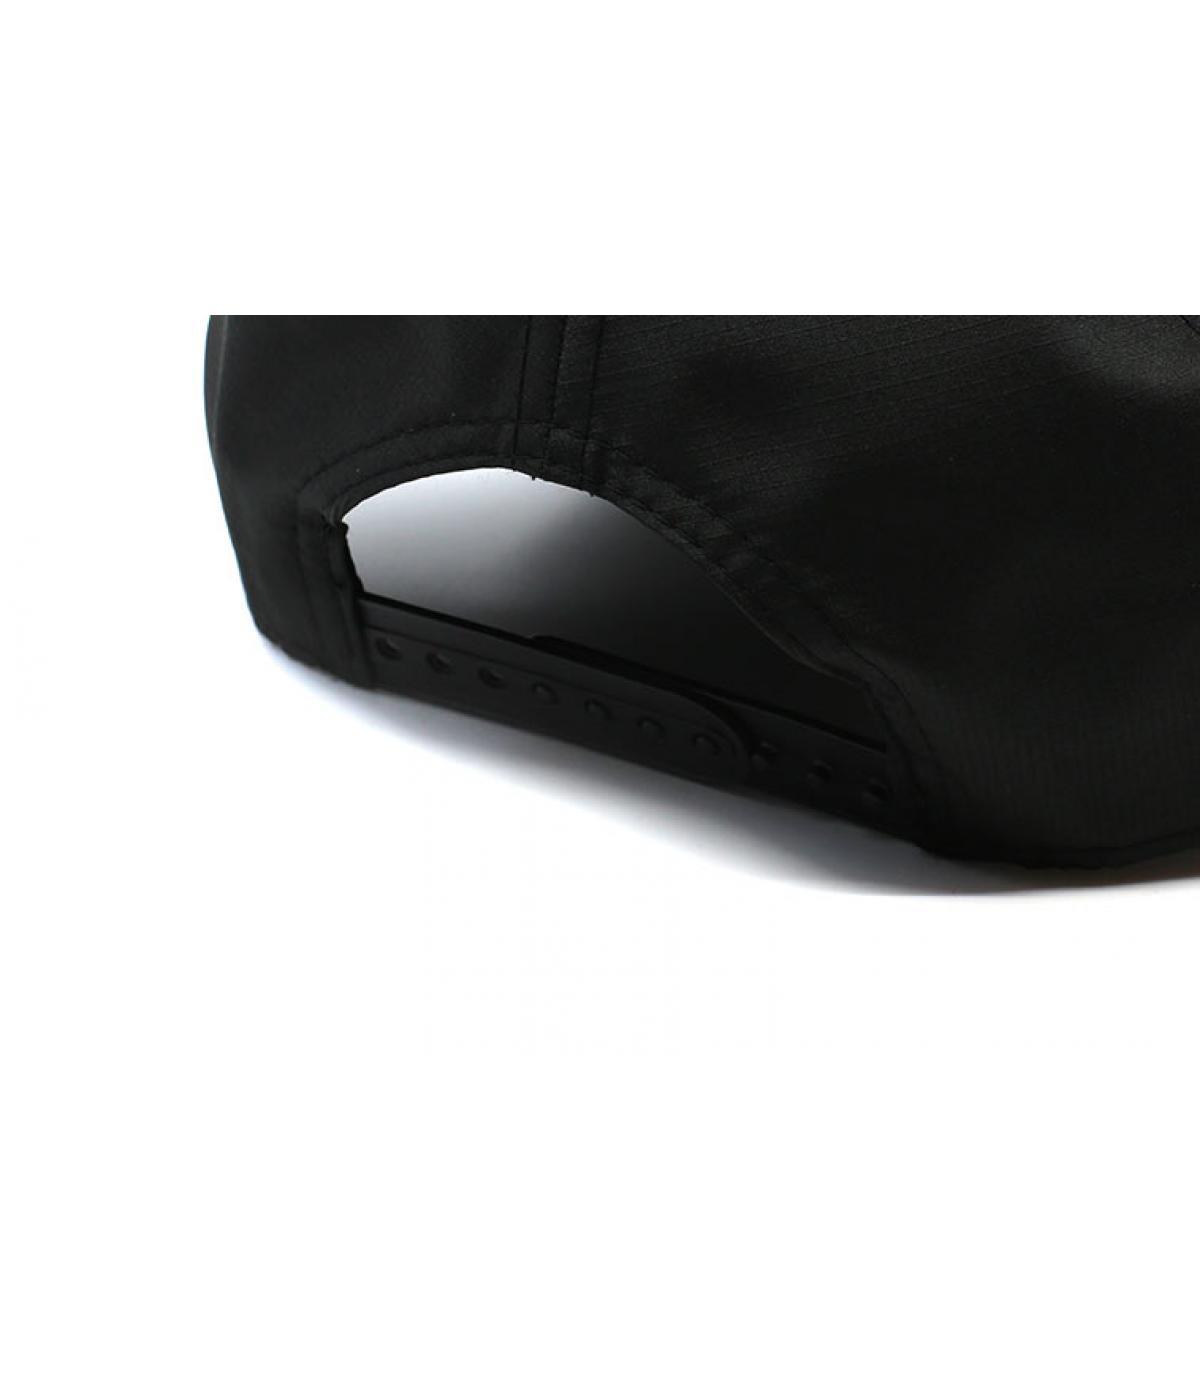 Dettagli Ripstop NY Aframe black maroon - image 5